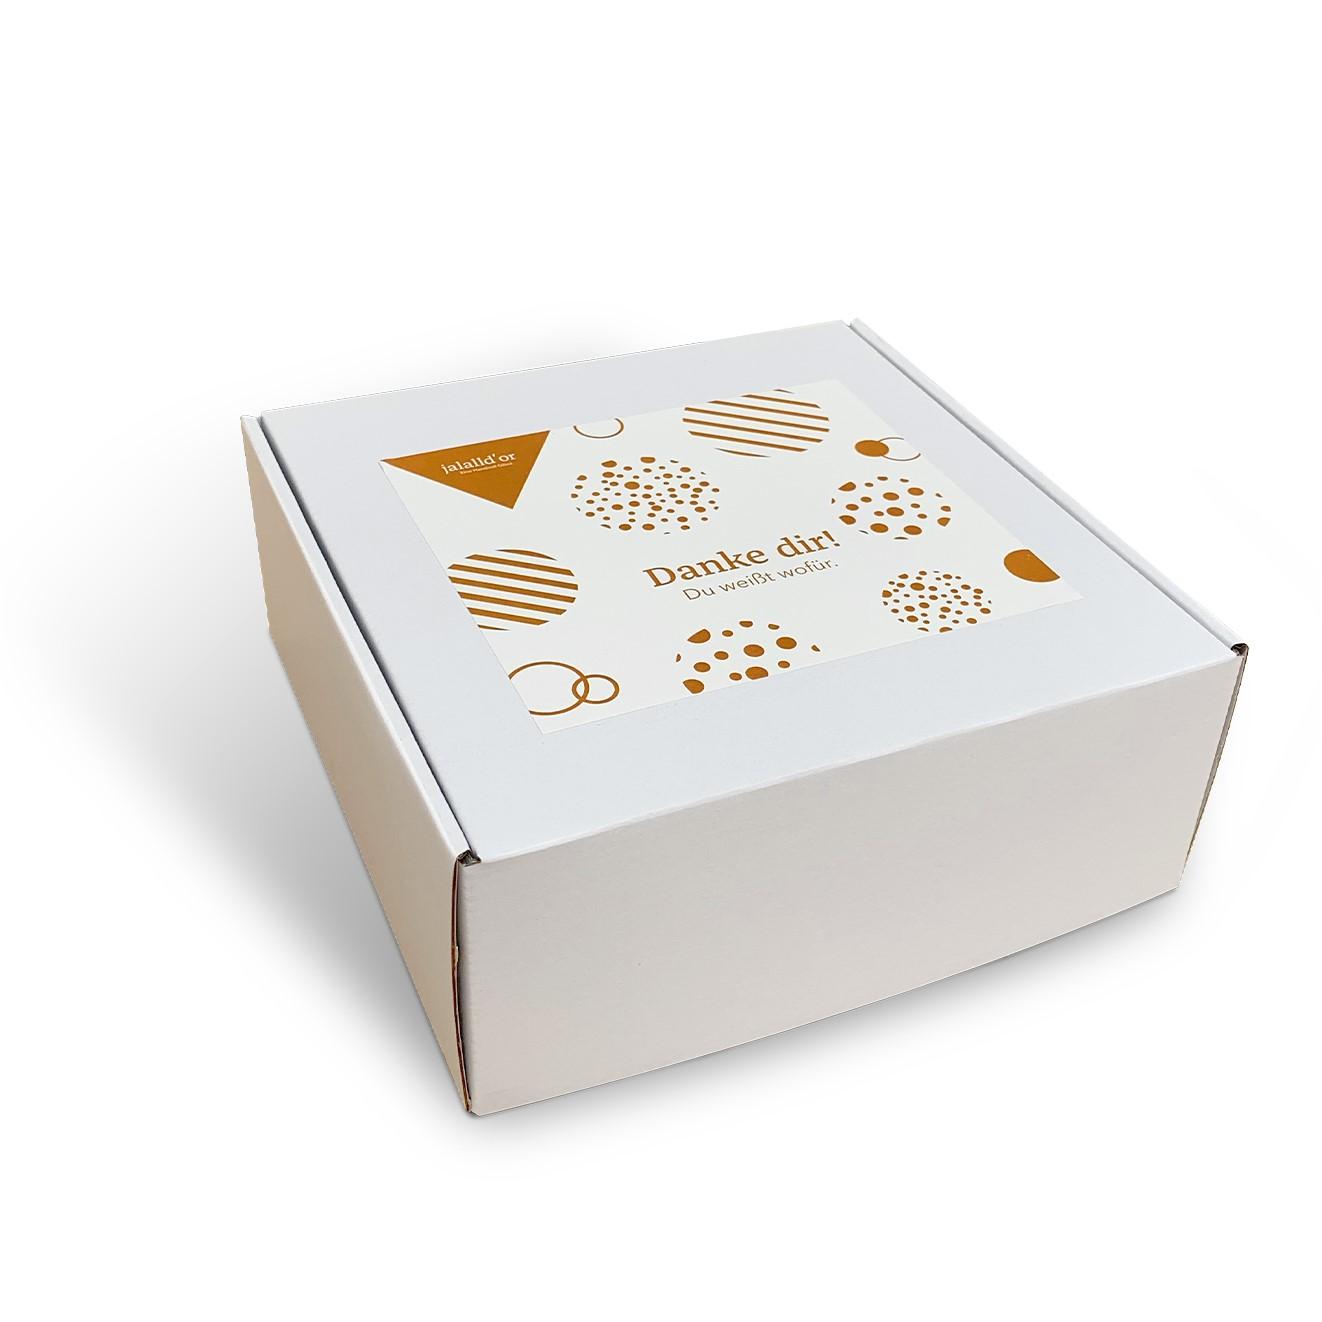 Box-Dankedir